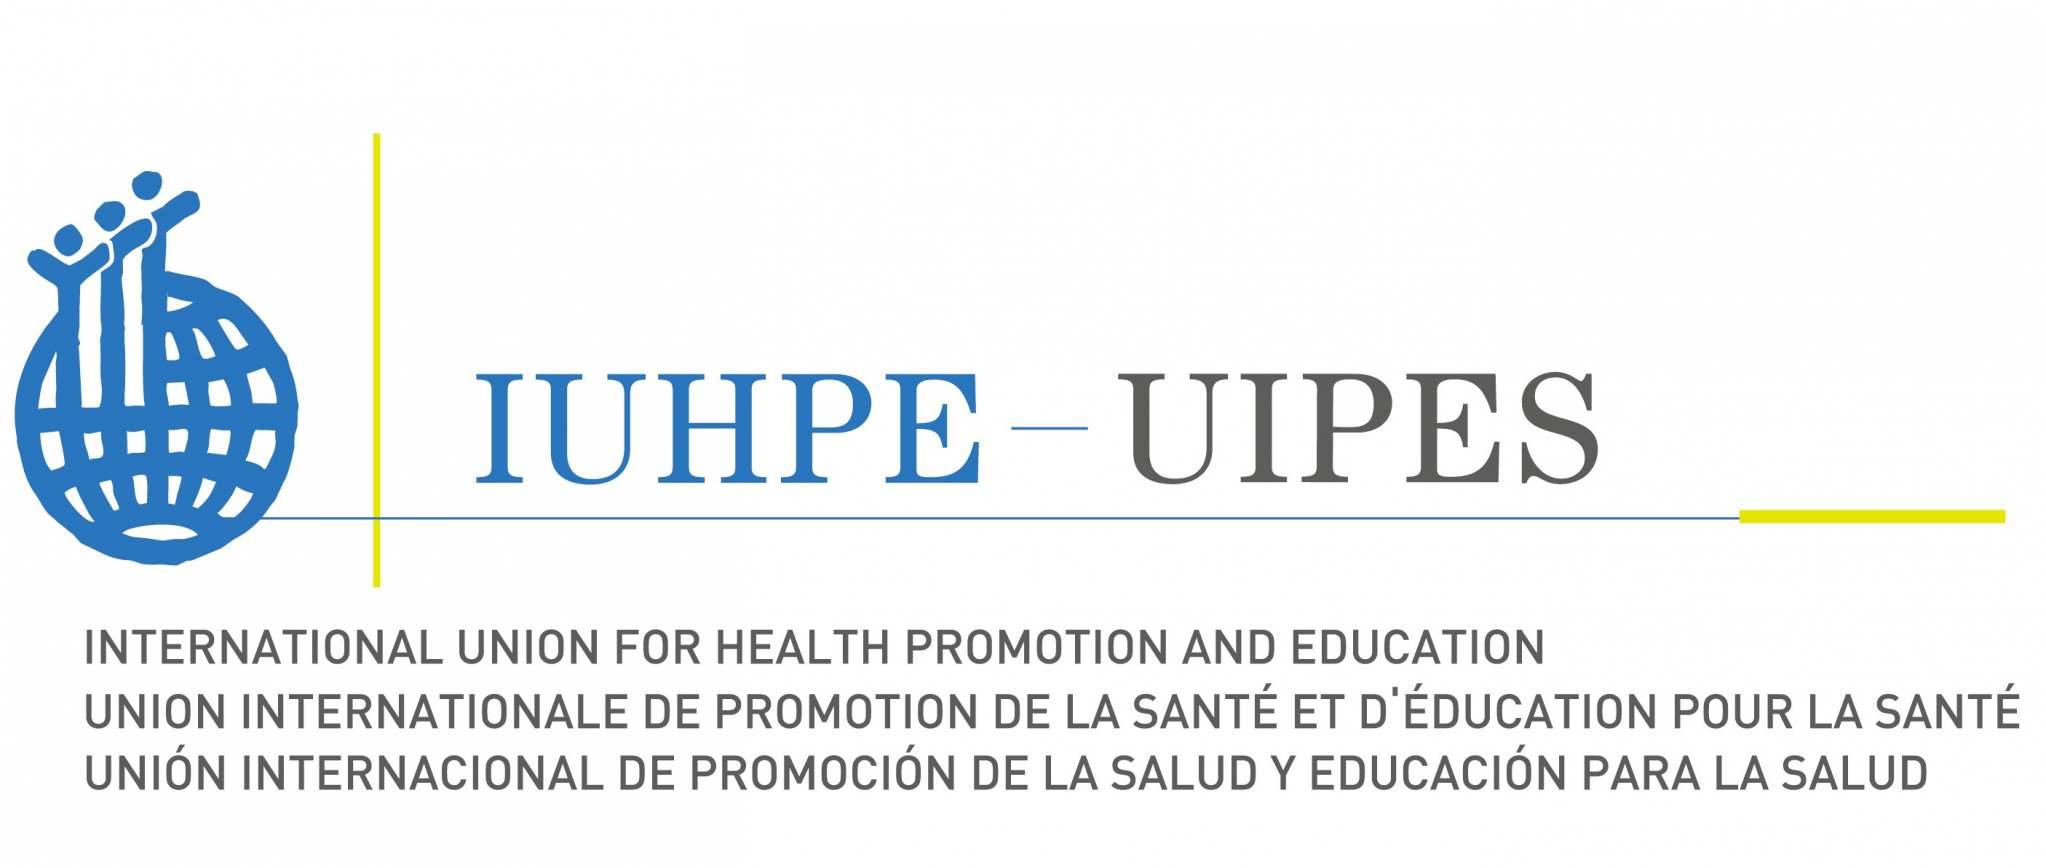 IUHPE-UIPES Logo